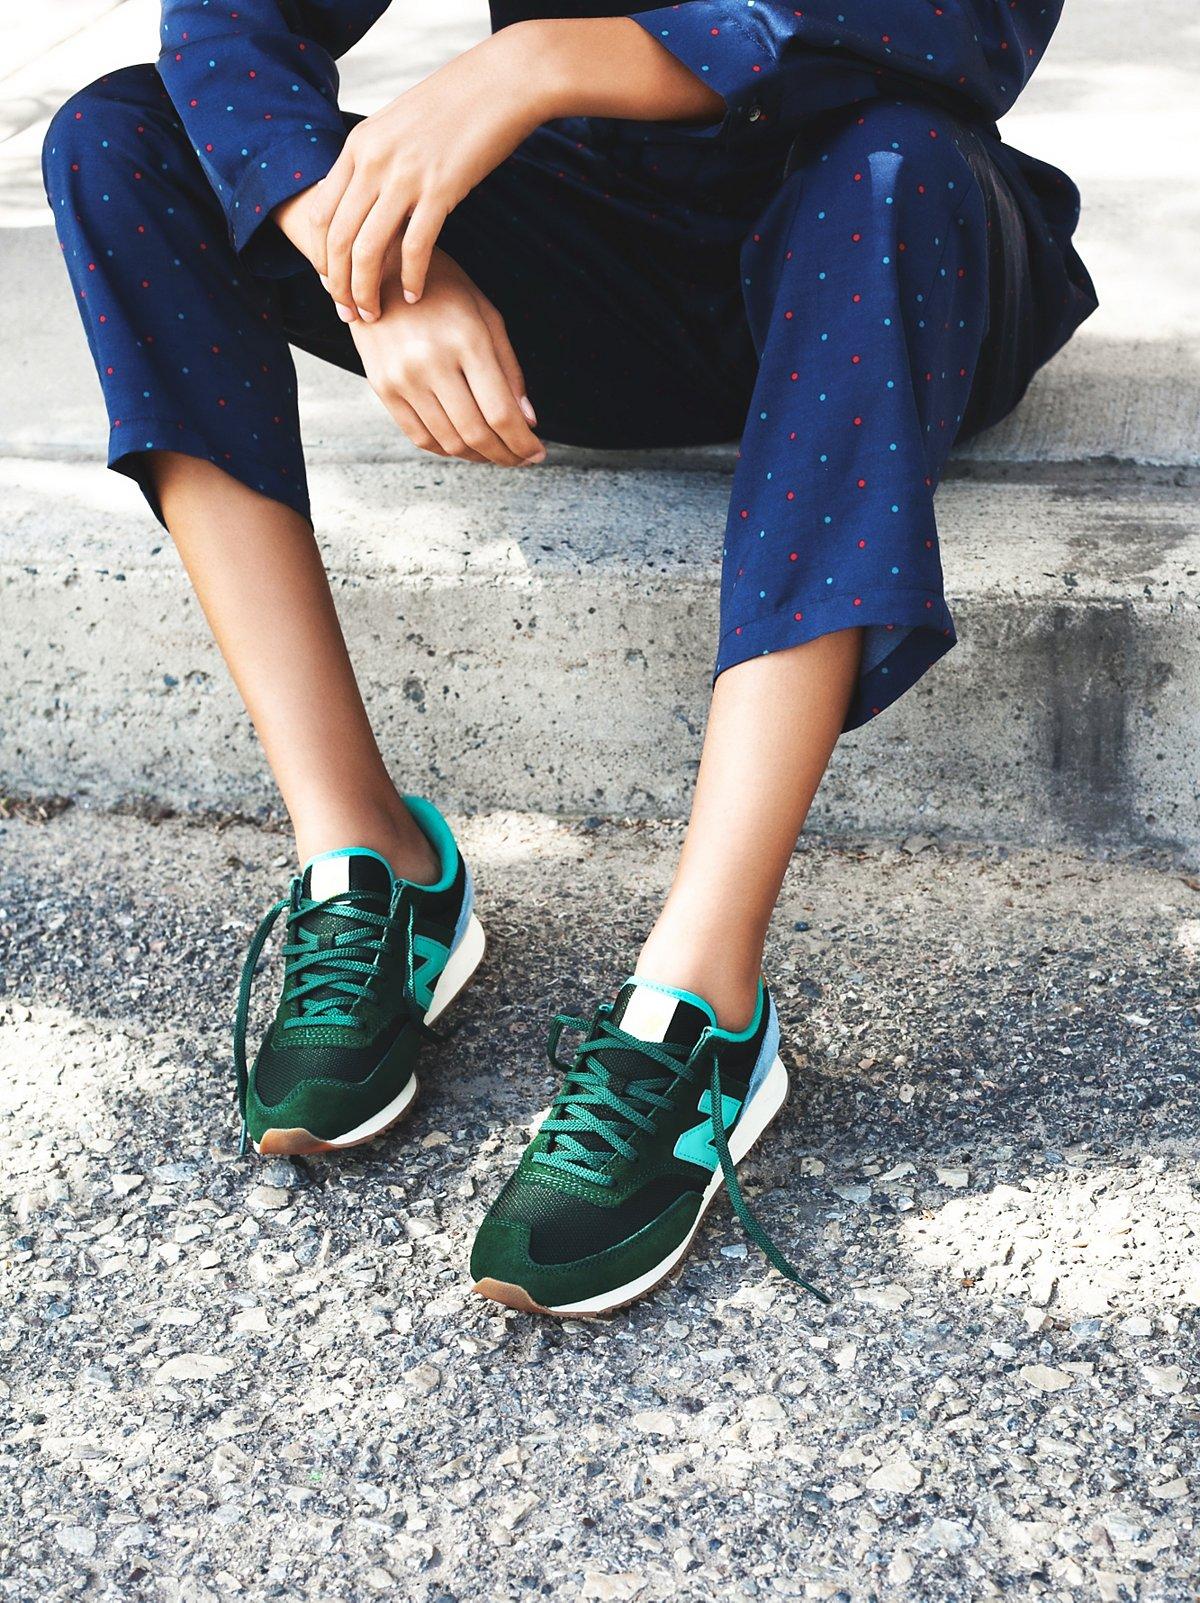 Capsule Wood运动鞋